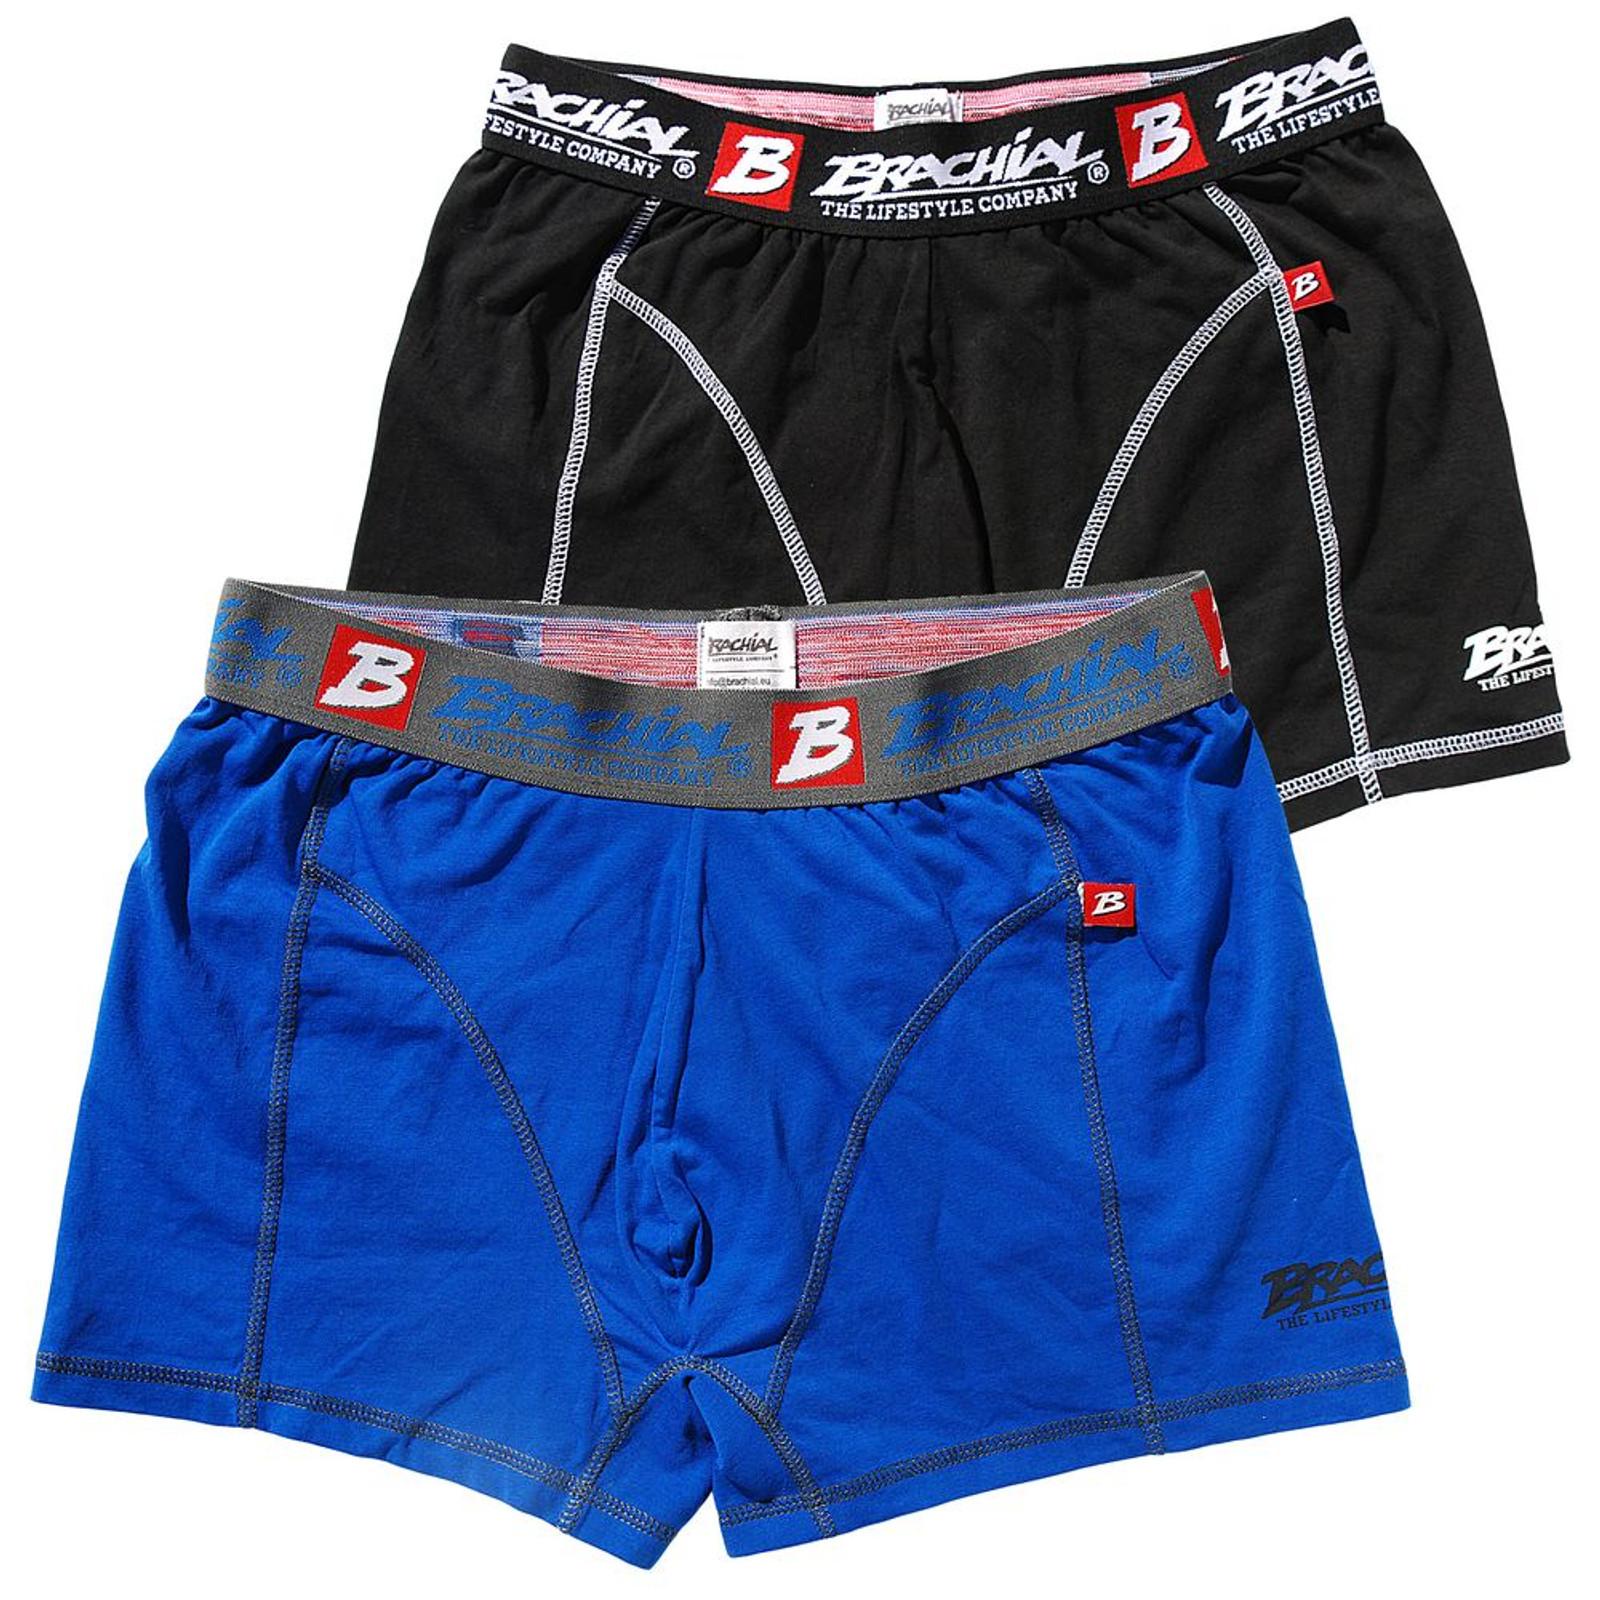 Brachial Herren 2-Pack Boxershorts Under